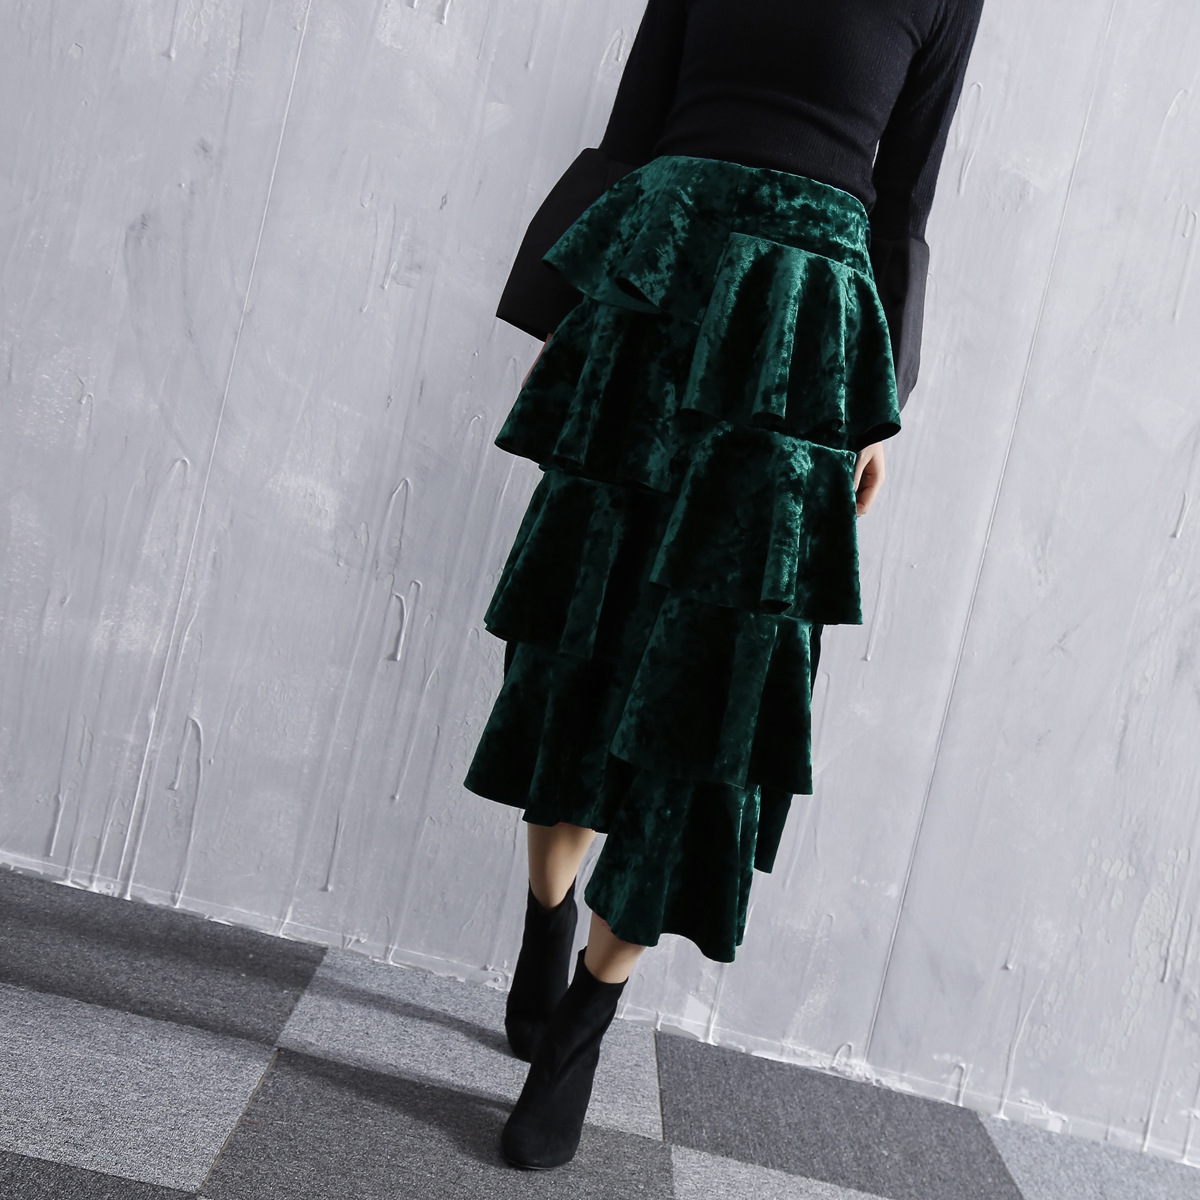 Faldas Mujer Vintage De Falda Mediados Otoño Asimétrico Qd691 Longitud Green Velvet negro Moda Cake Alta Invierno Cintura 2018 FxOzIw